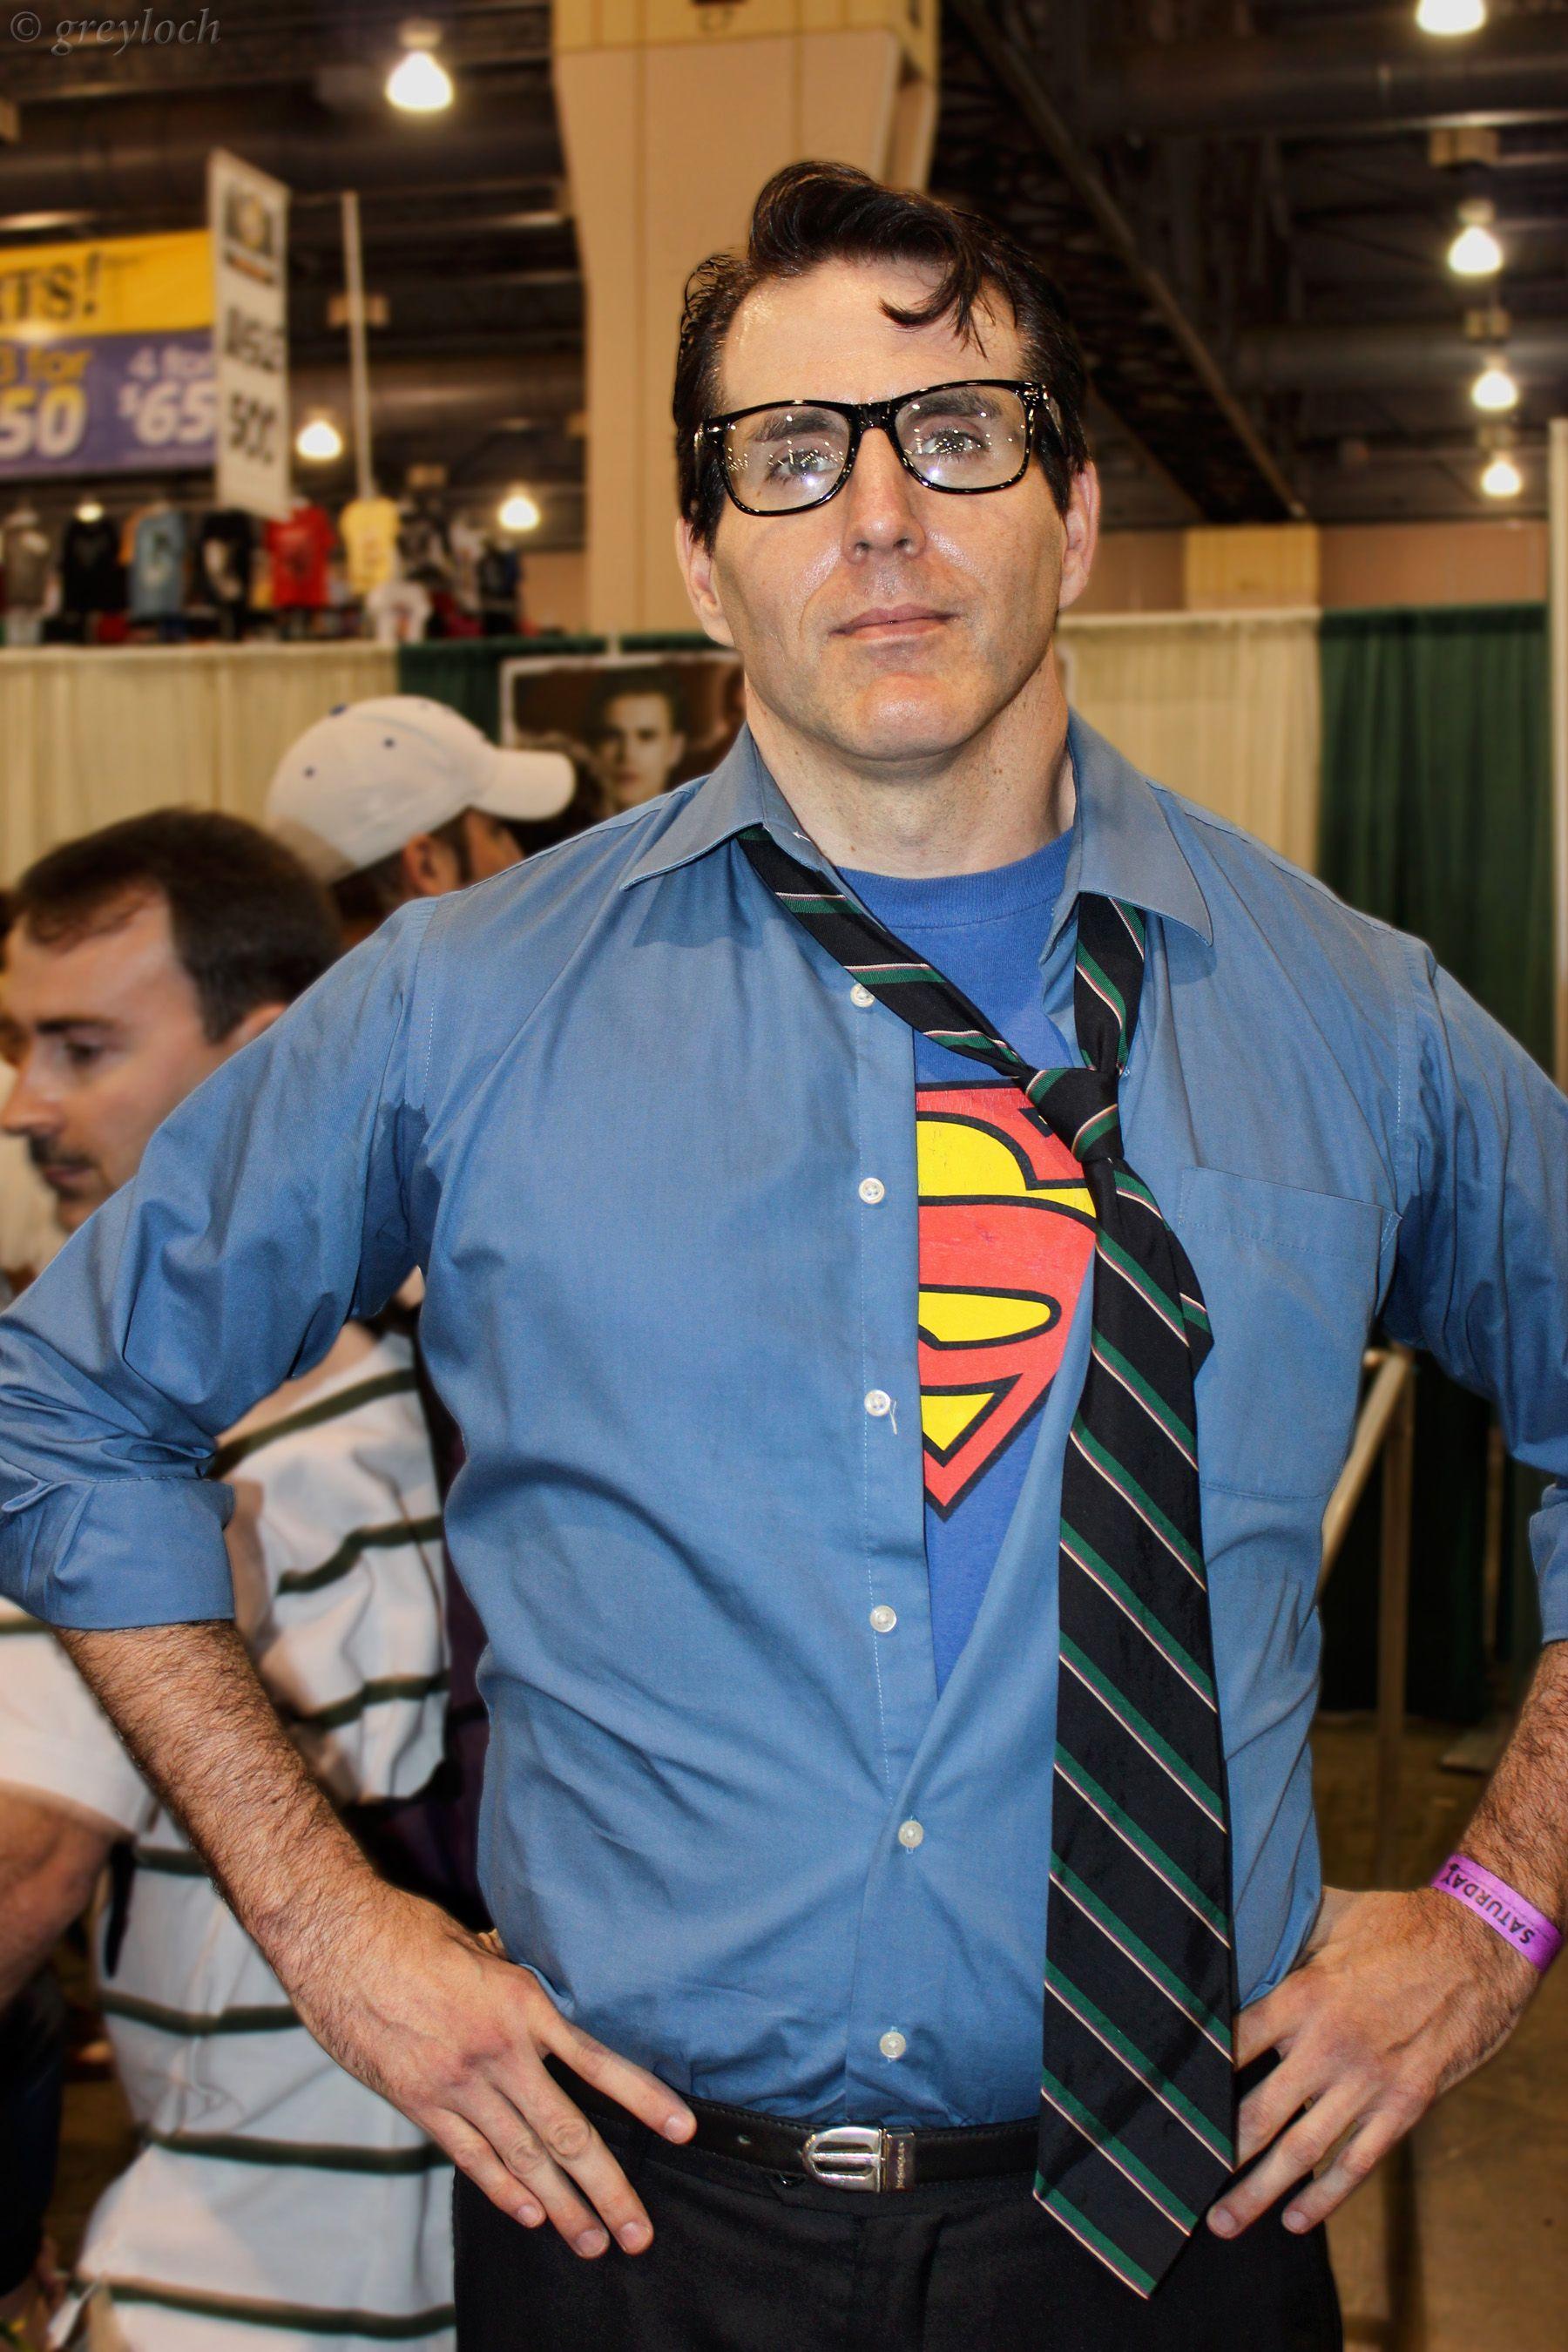 How To Create A Realistic Hero When Writing Fiction Diy Superhero Costume Character Costumes Diy Hero Costumes Diy